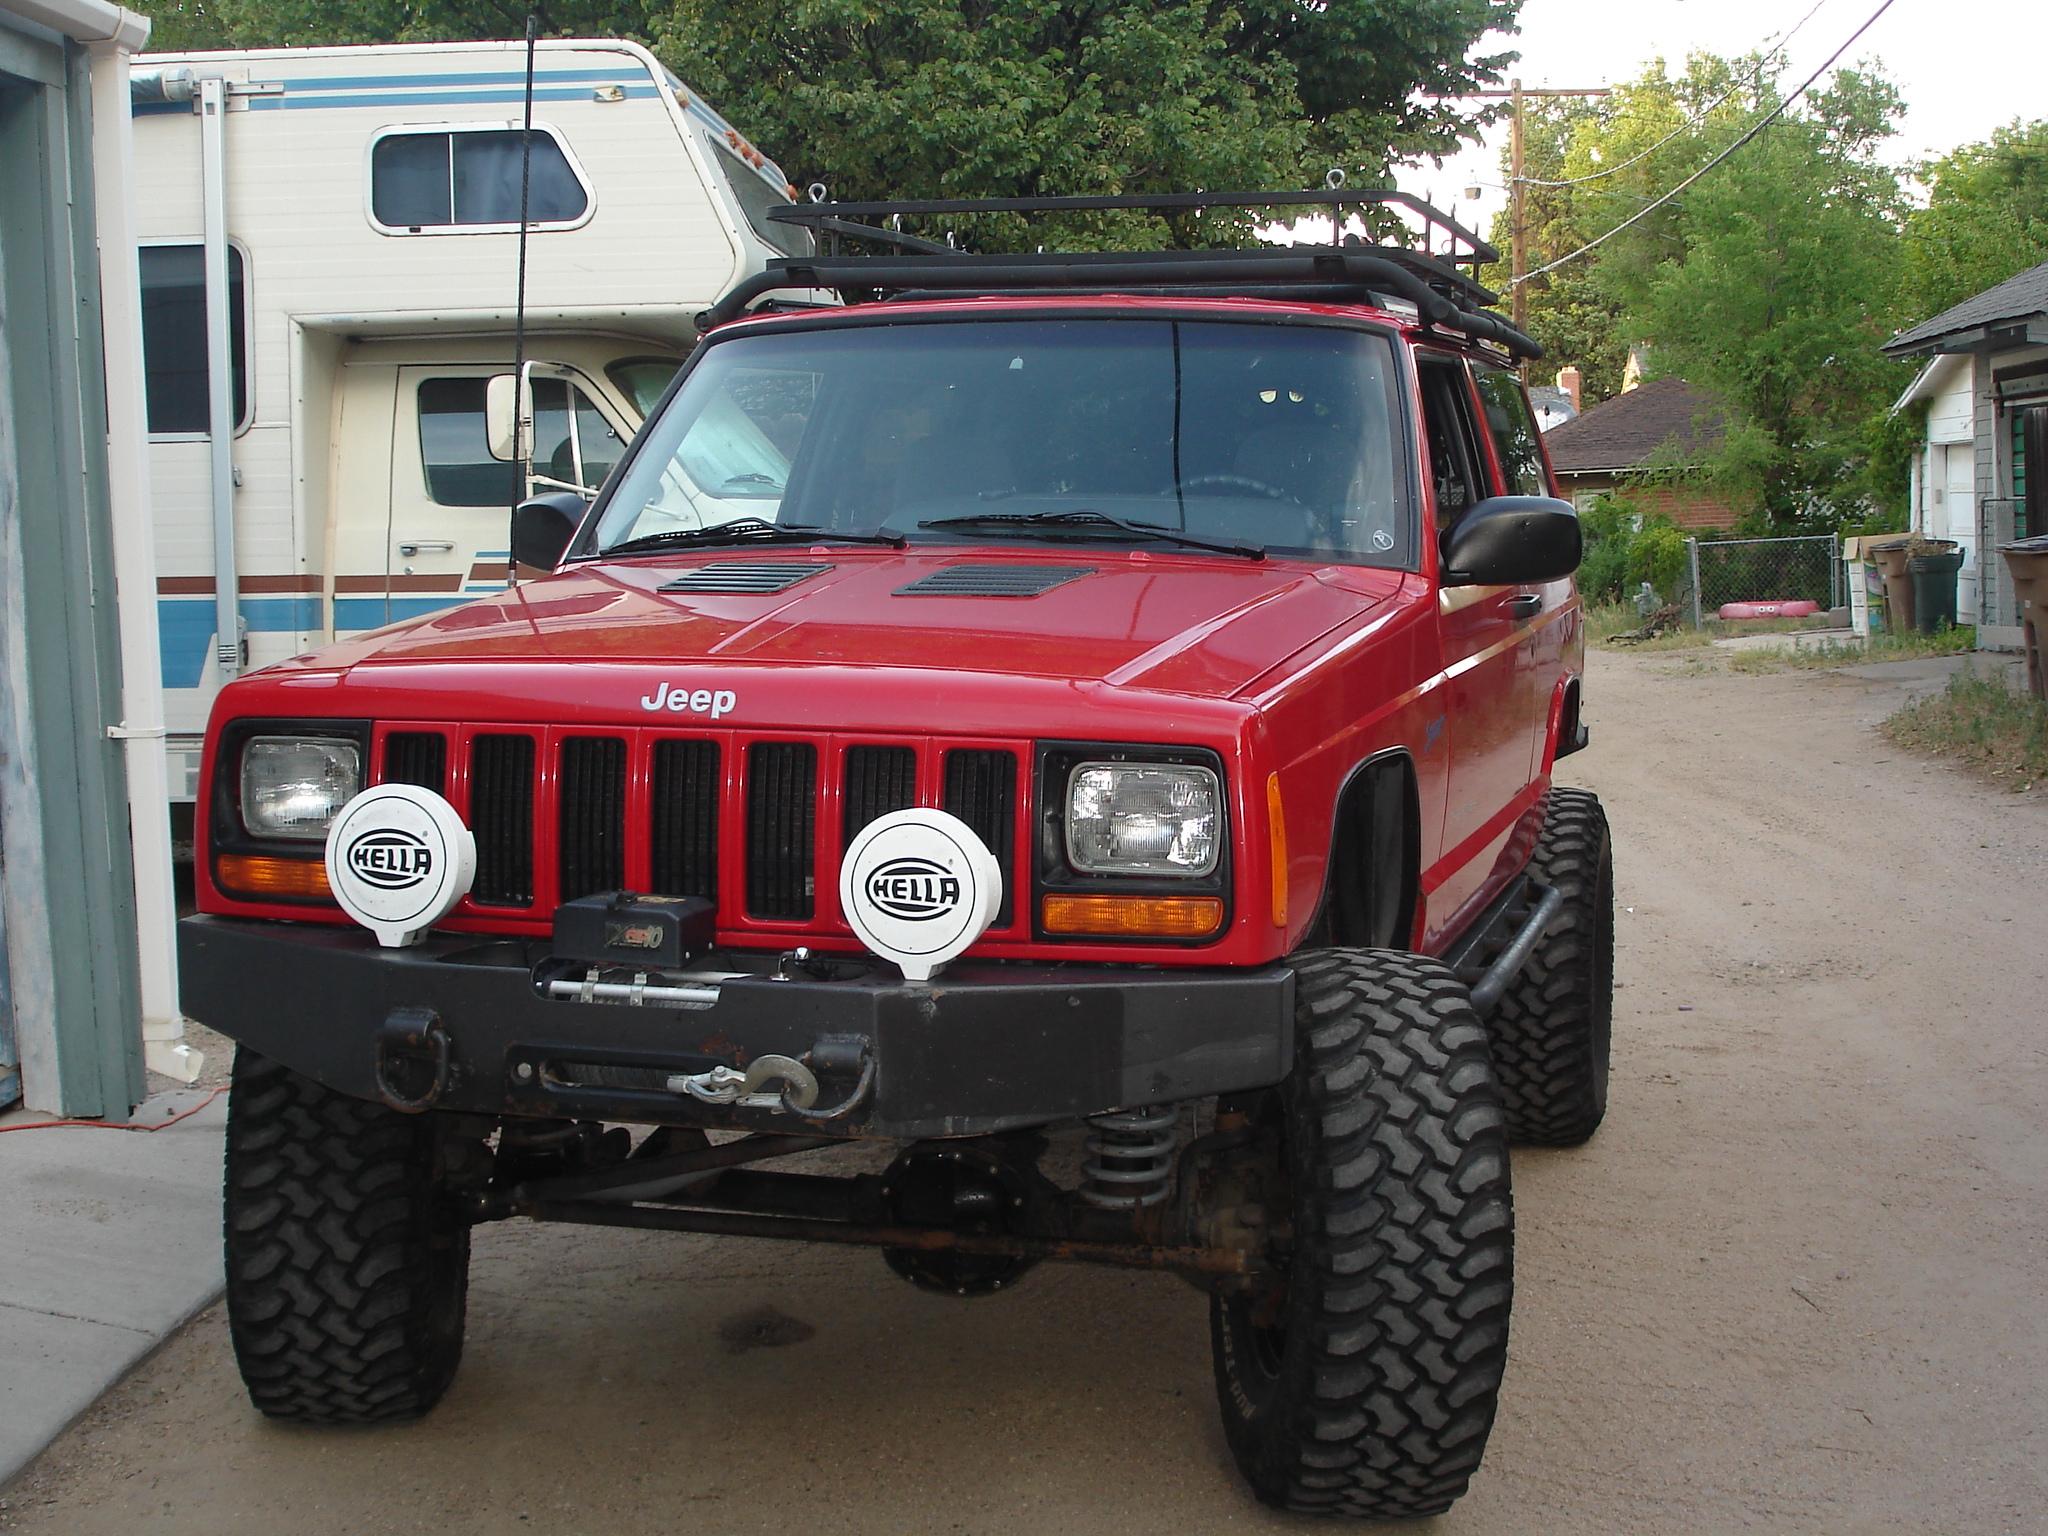 98_Jeep_Cherokee_Sport_001